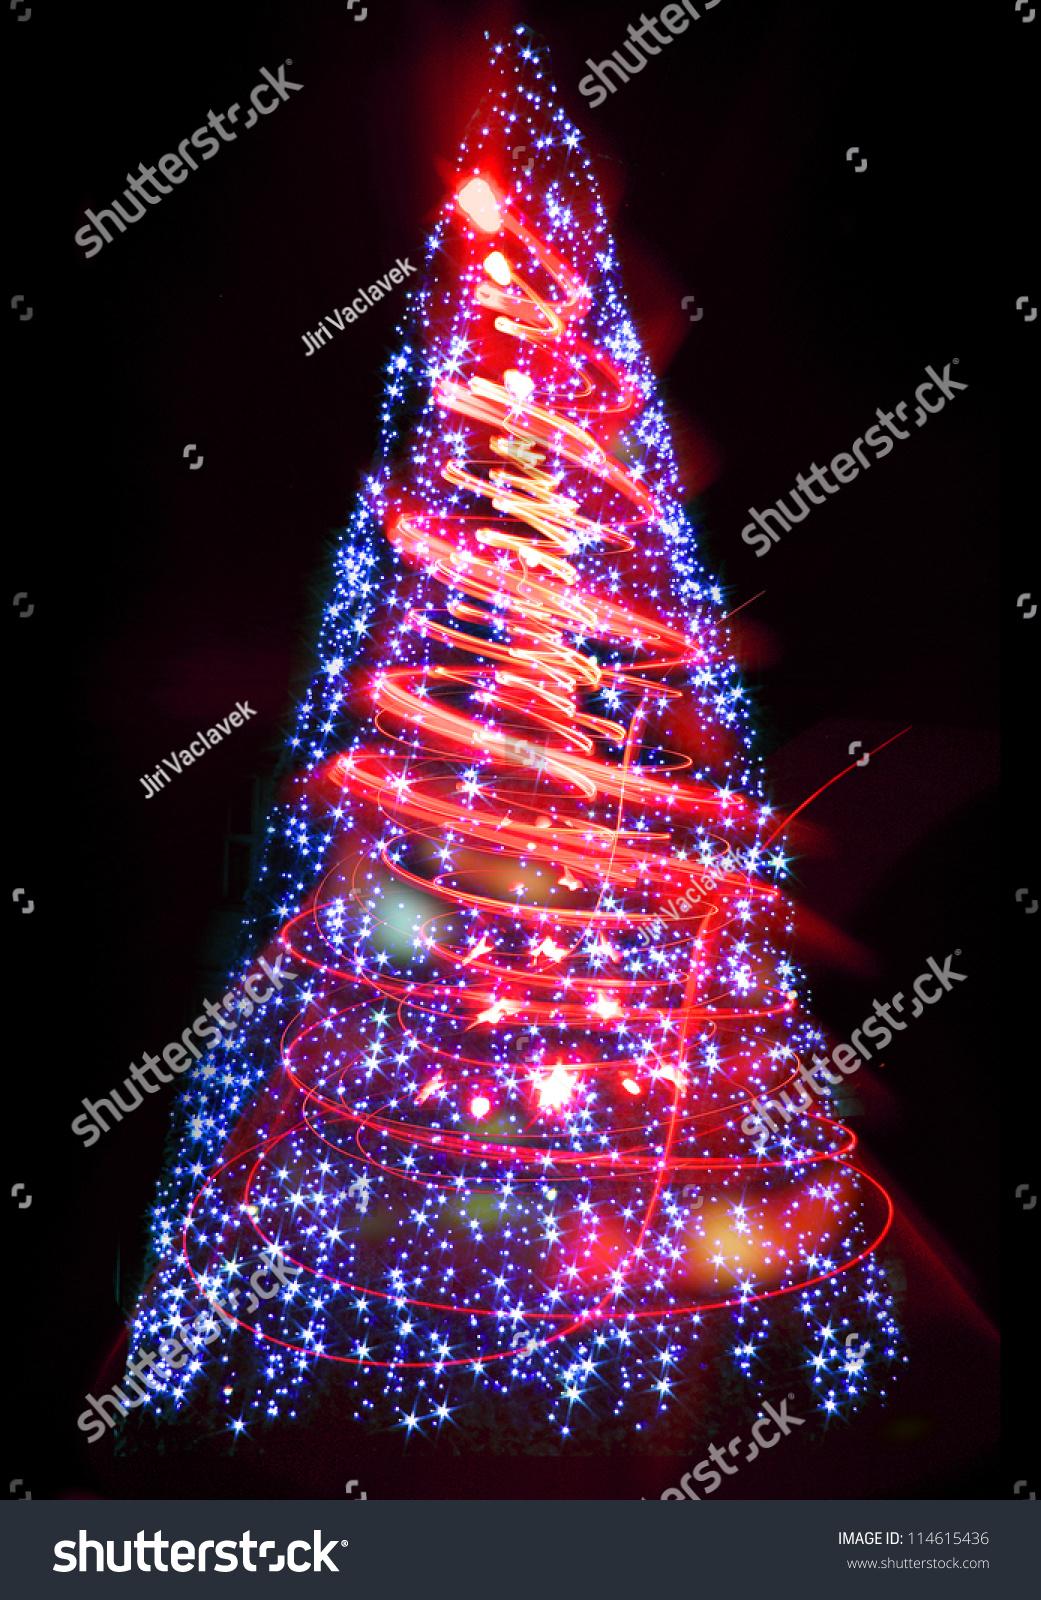 xmas tree as very nice christmas background from color lights - Nice Christmas Trees